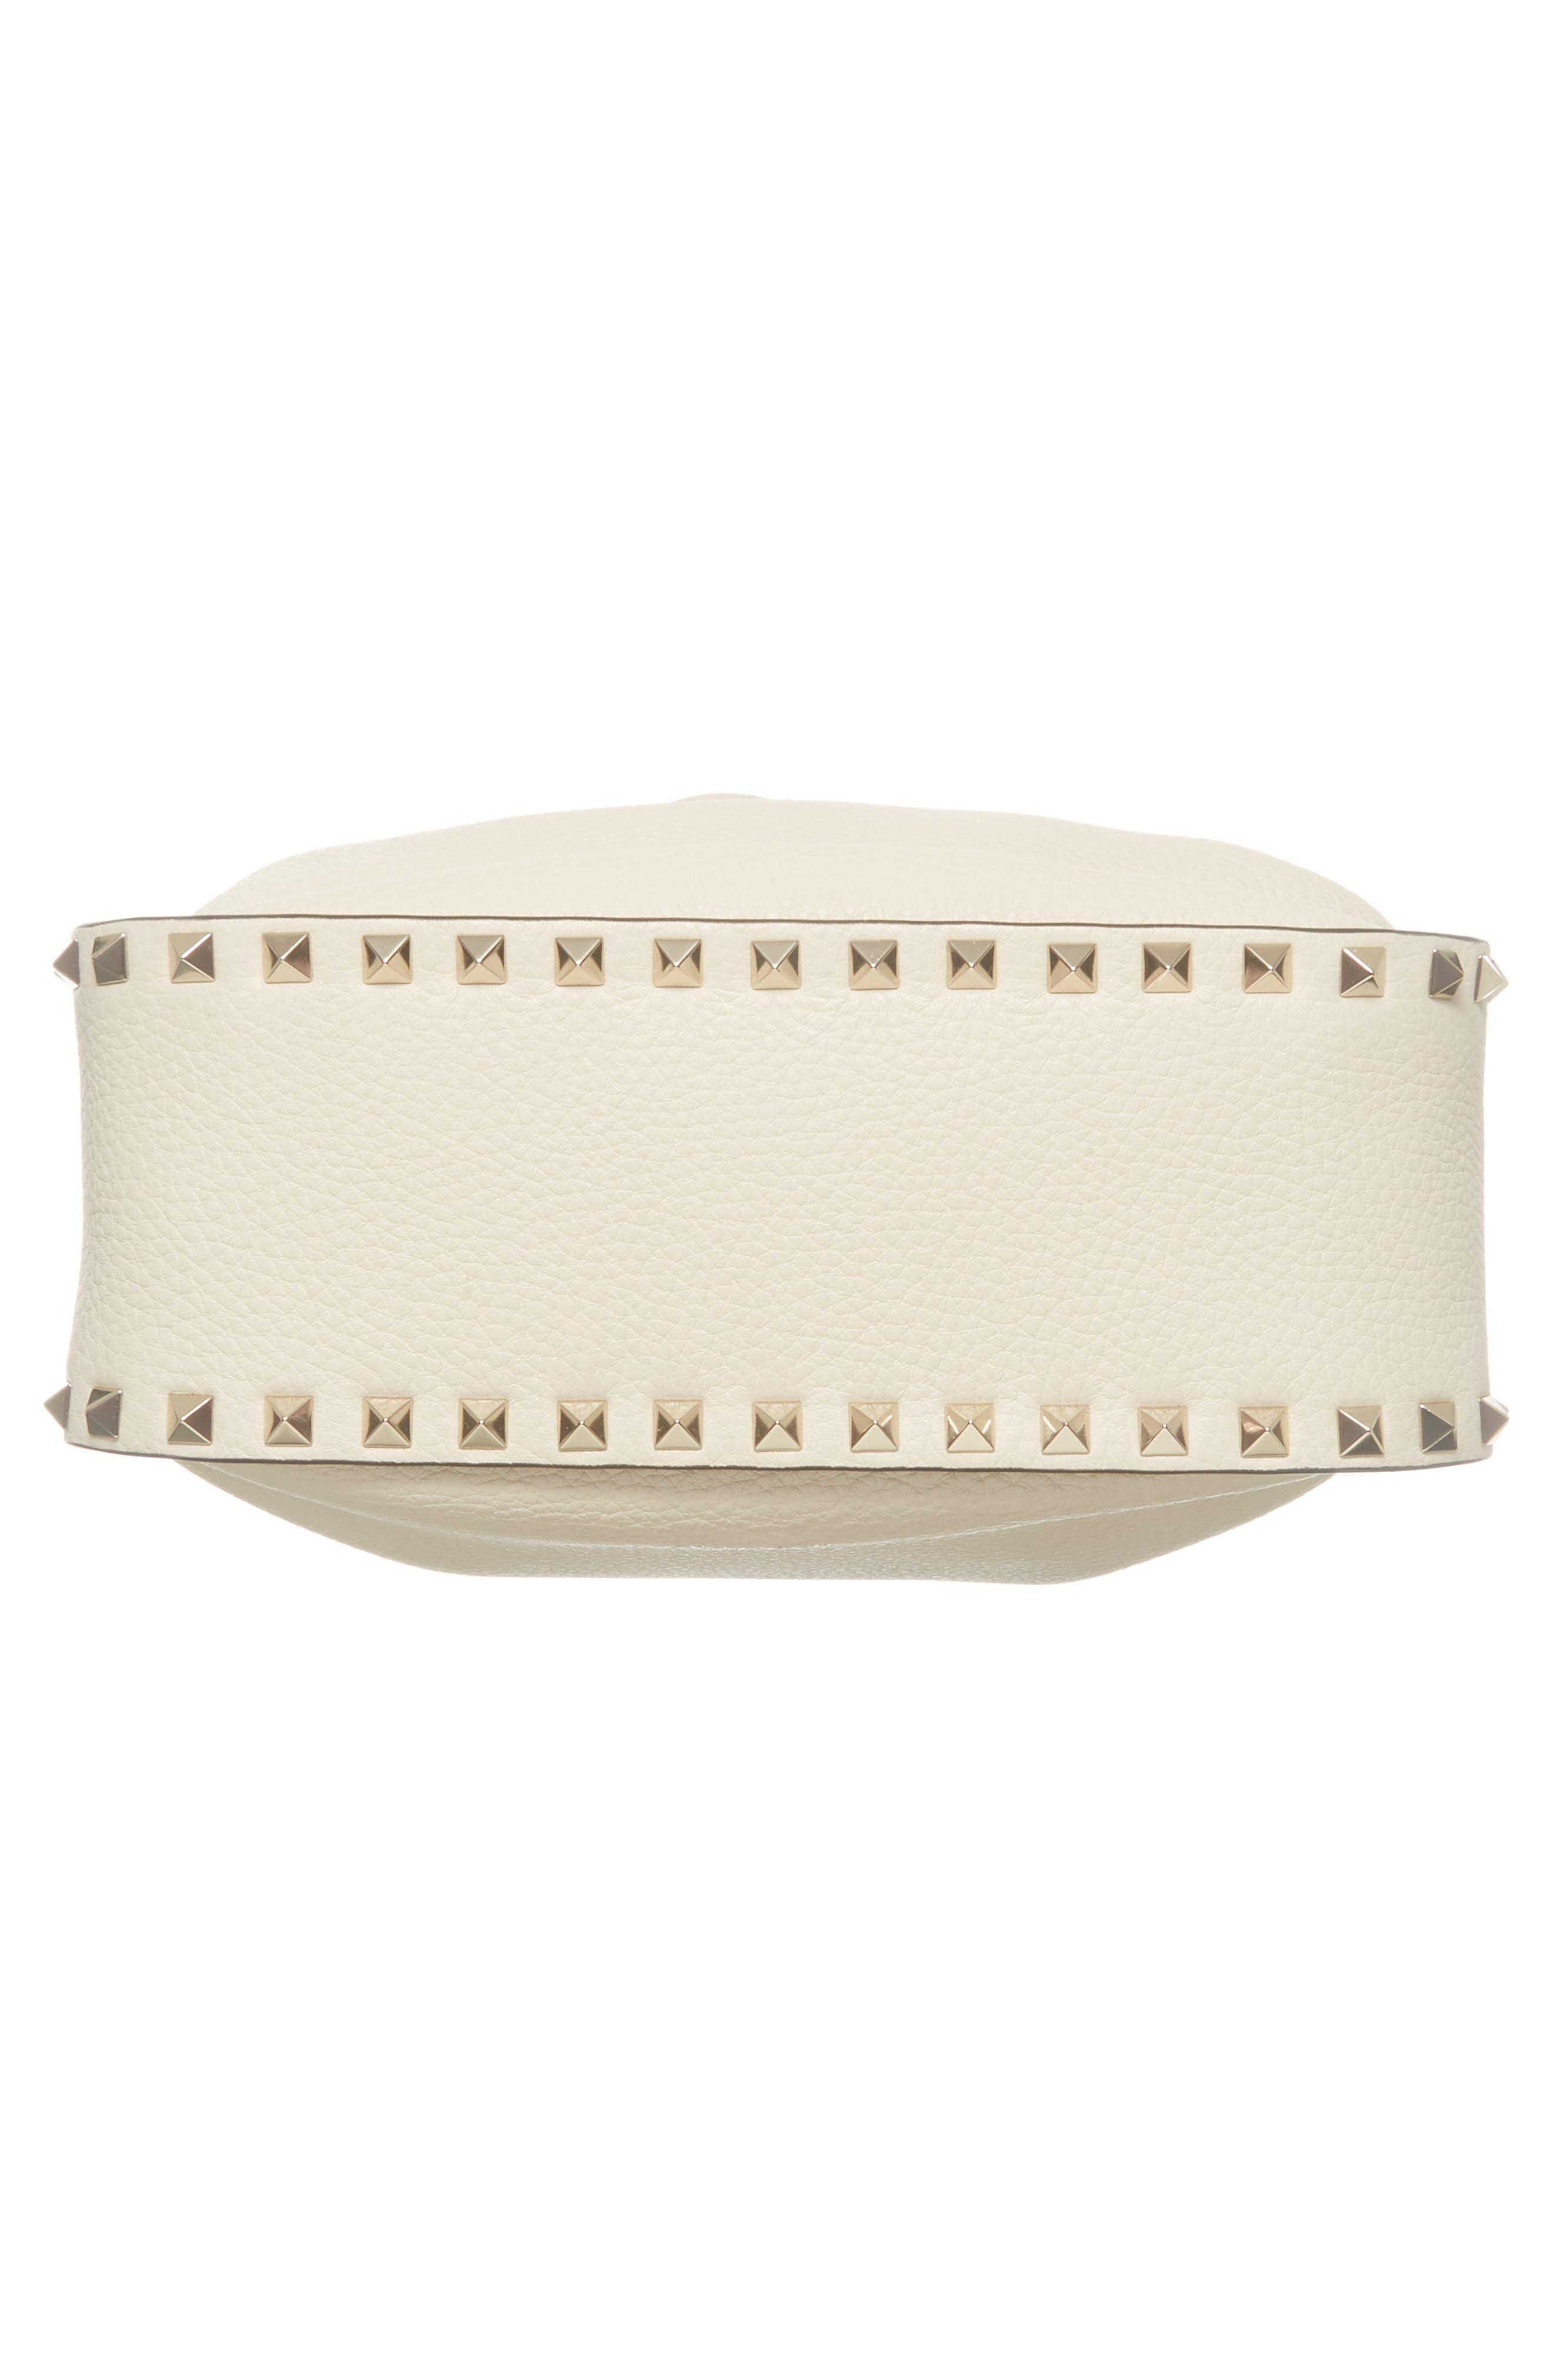 Large Rockstud Leather Bucket Bag,                             Alternate thumbnail 6, color,                             Ivory/ Gold